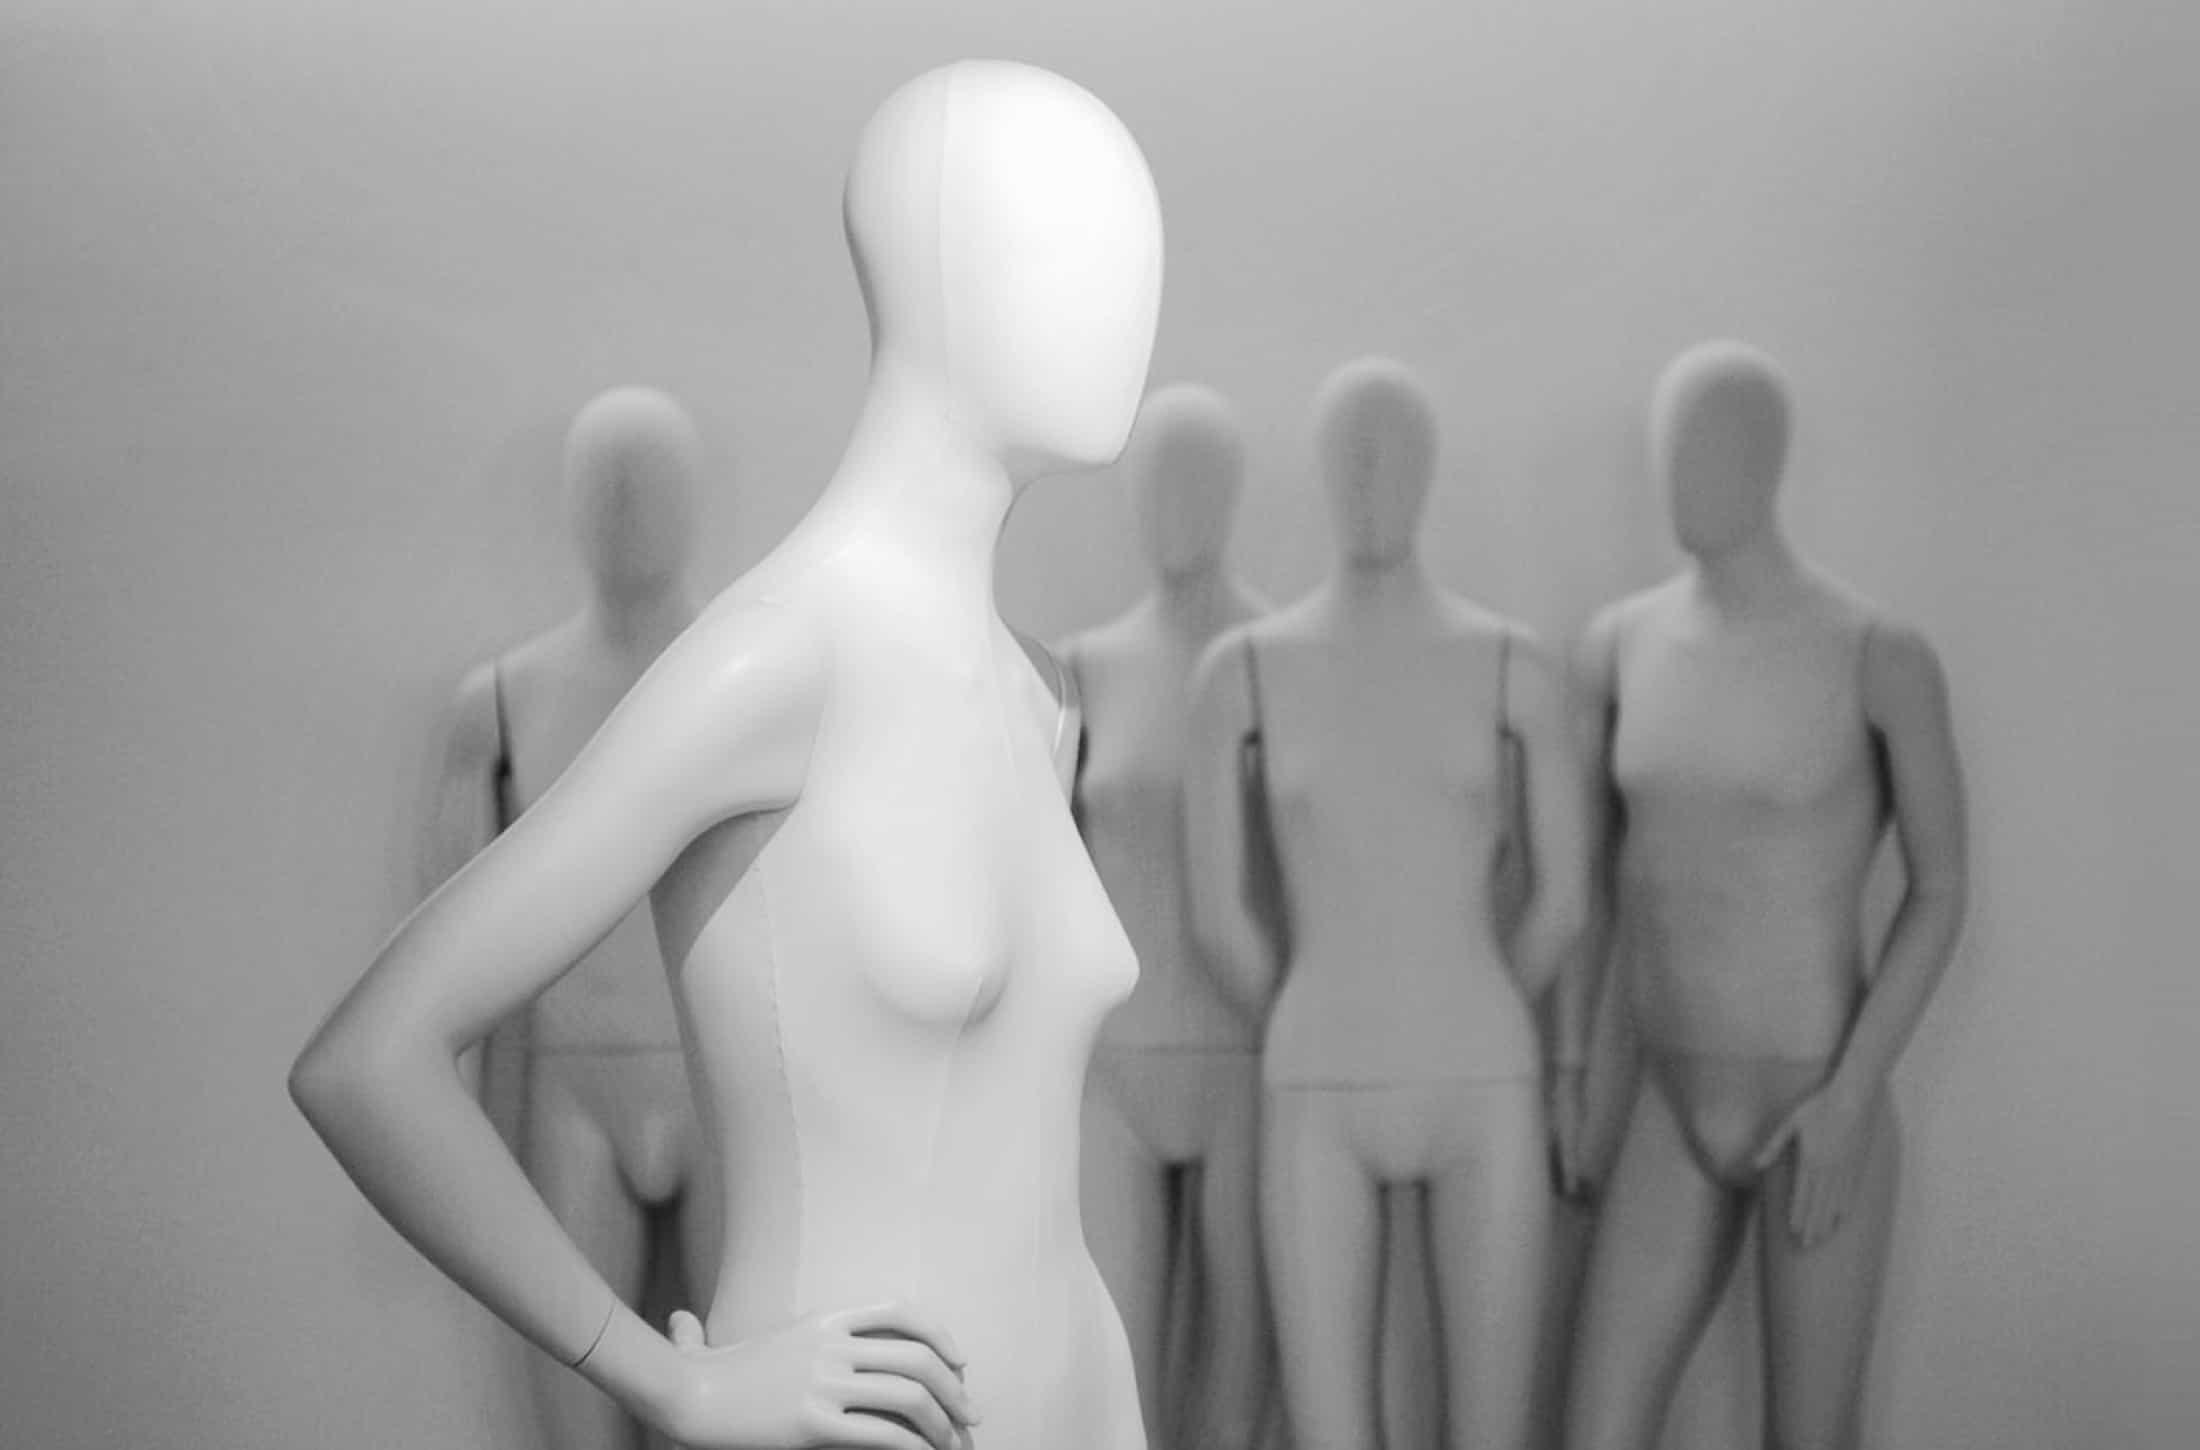 bonaveri fashion model mannequin collection 05